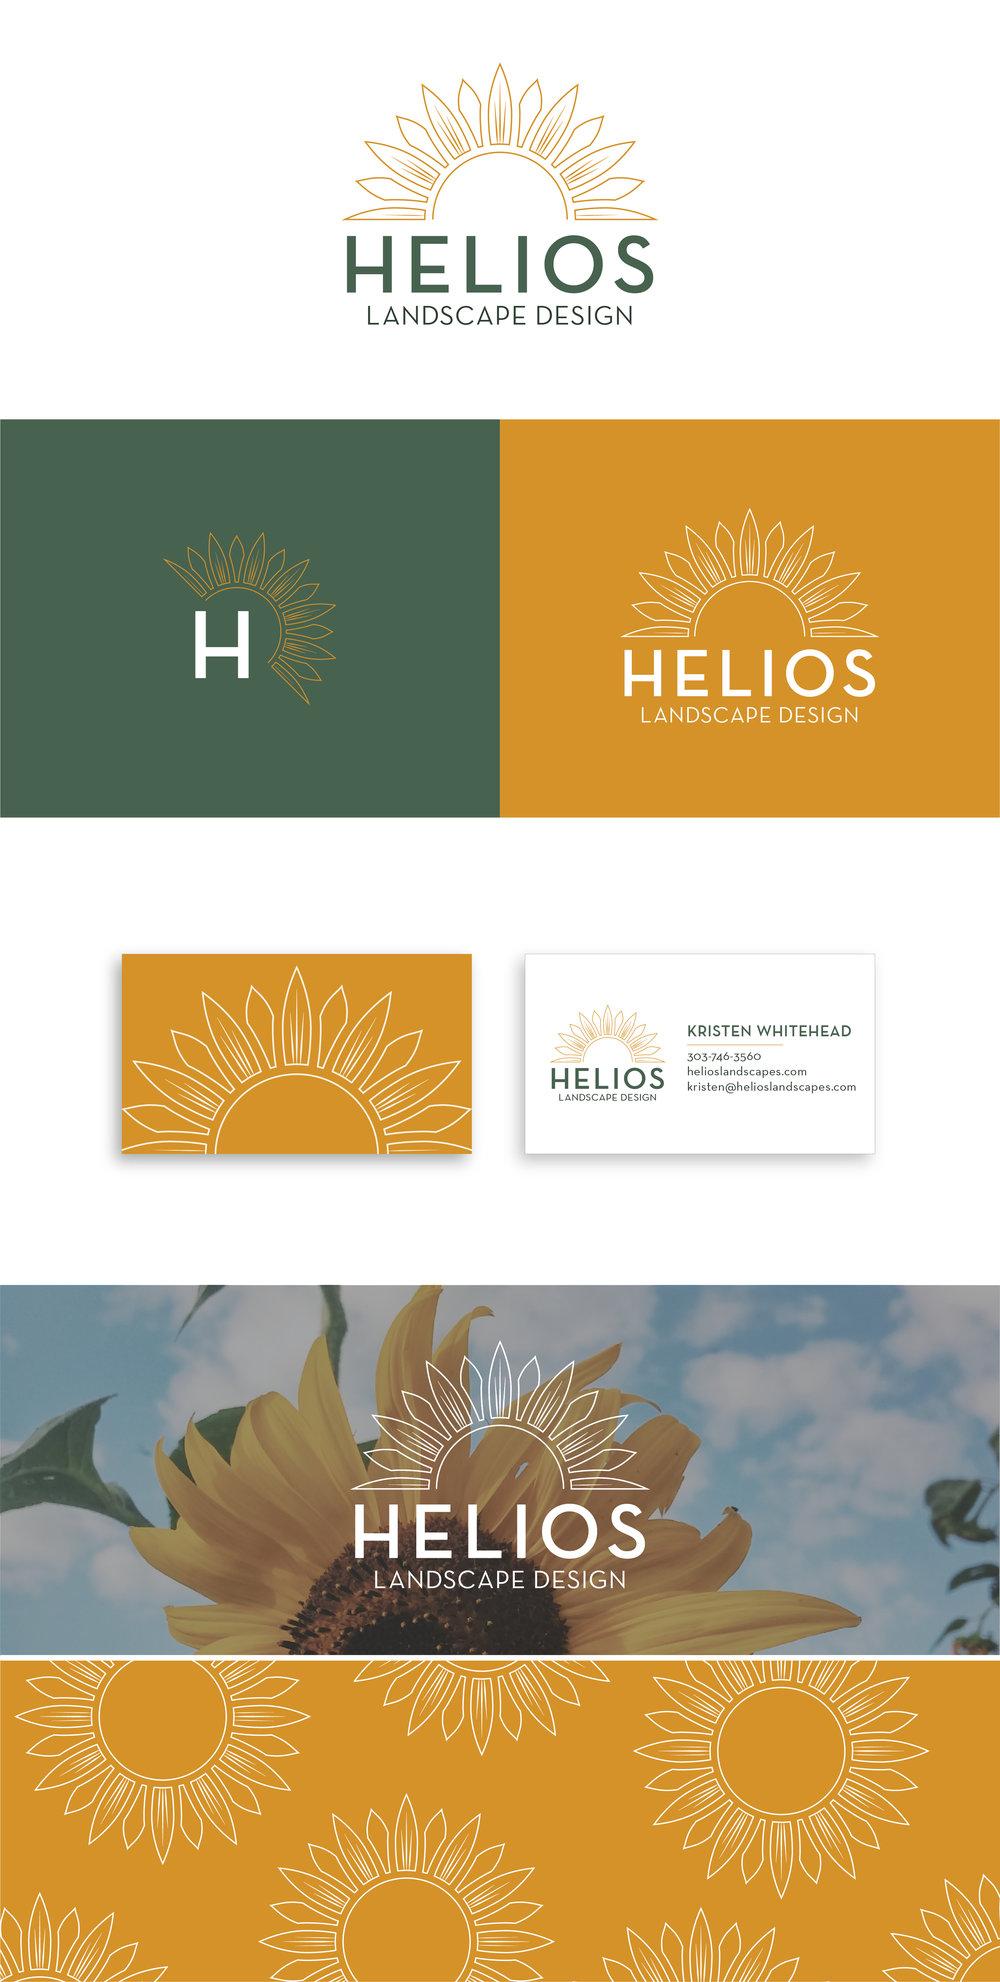 HeliosLandscapeDesign_LogoTrials-03.jpg